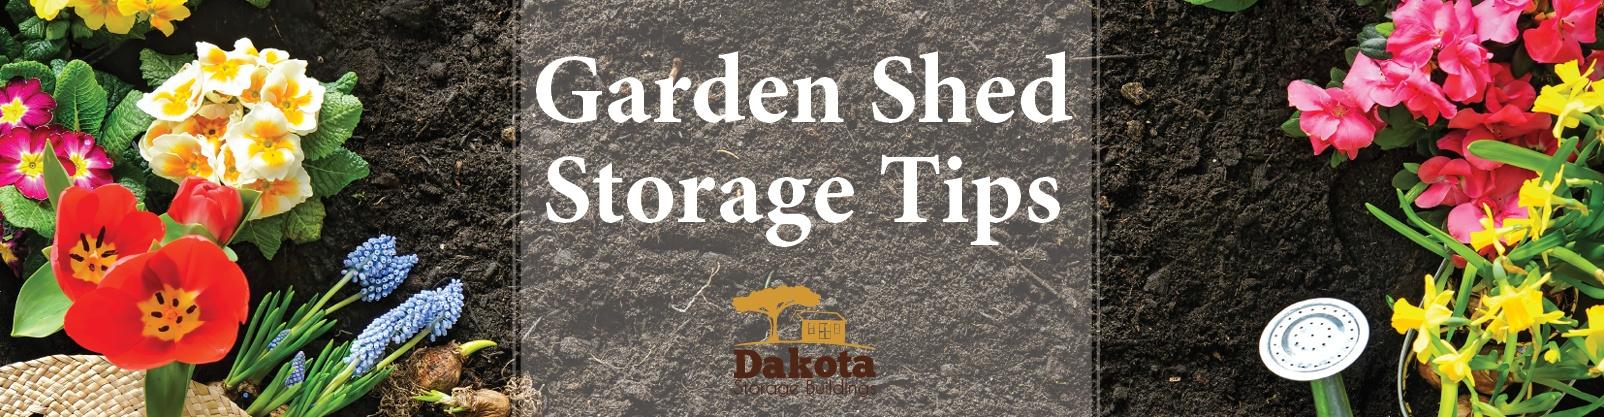 Garden Shed Storage Tips